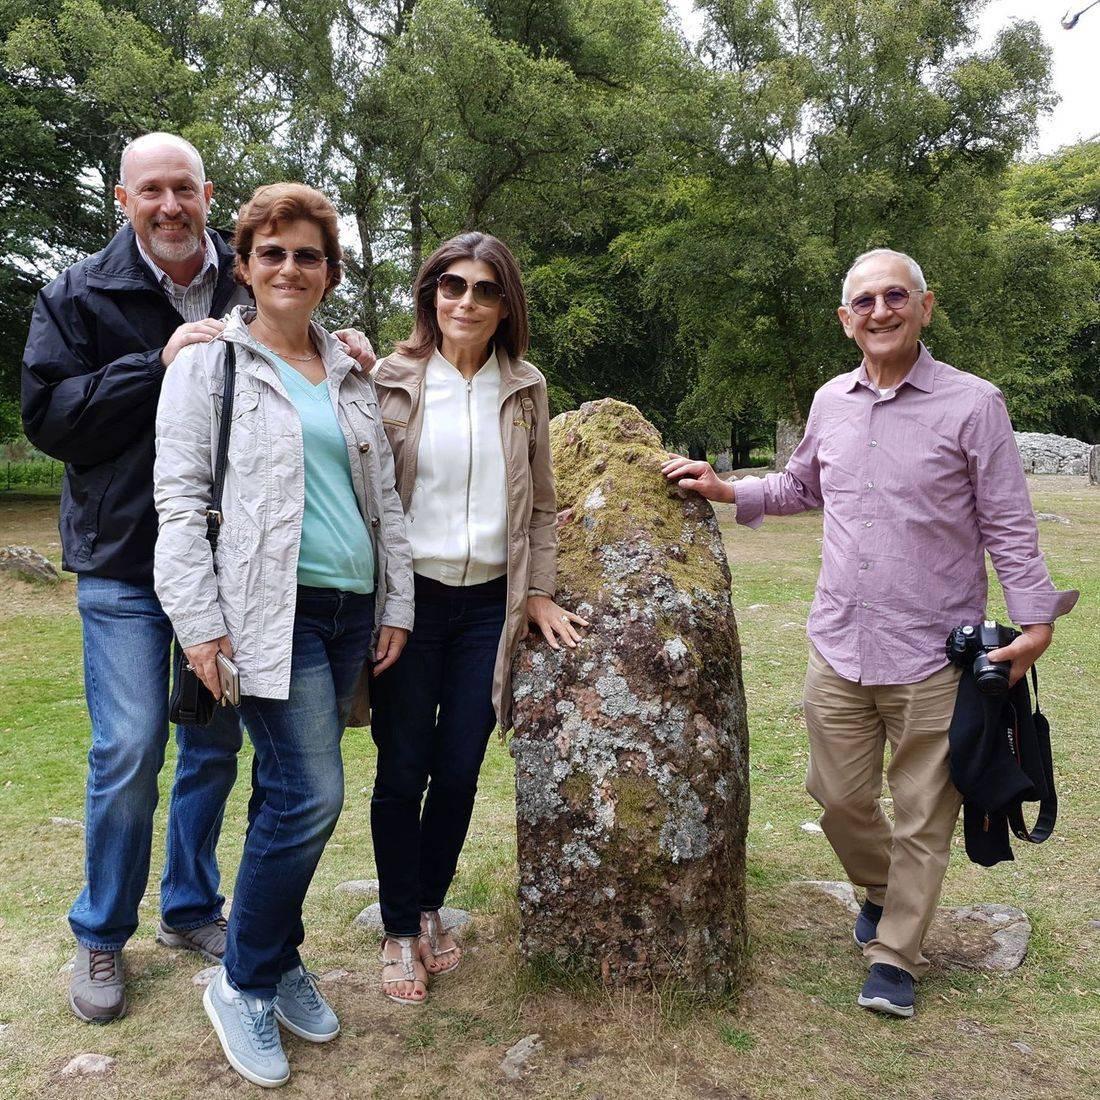 invergordon outlander tour 2018